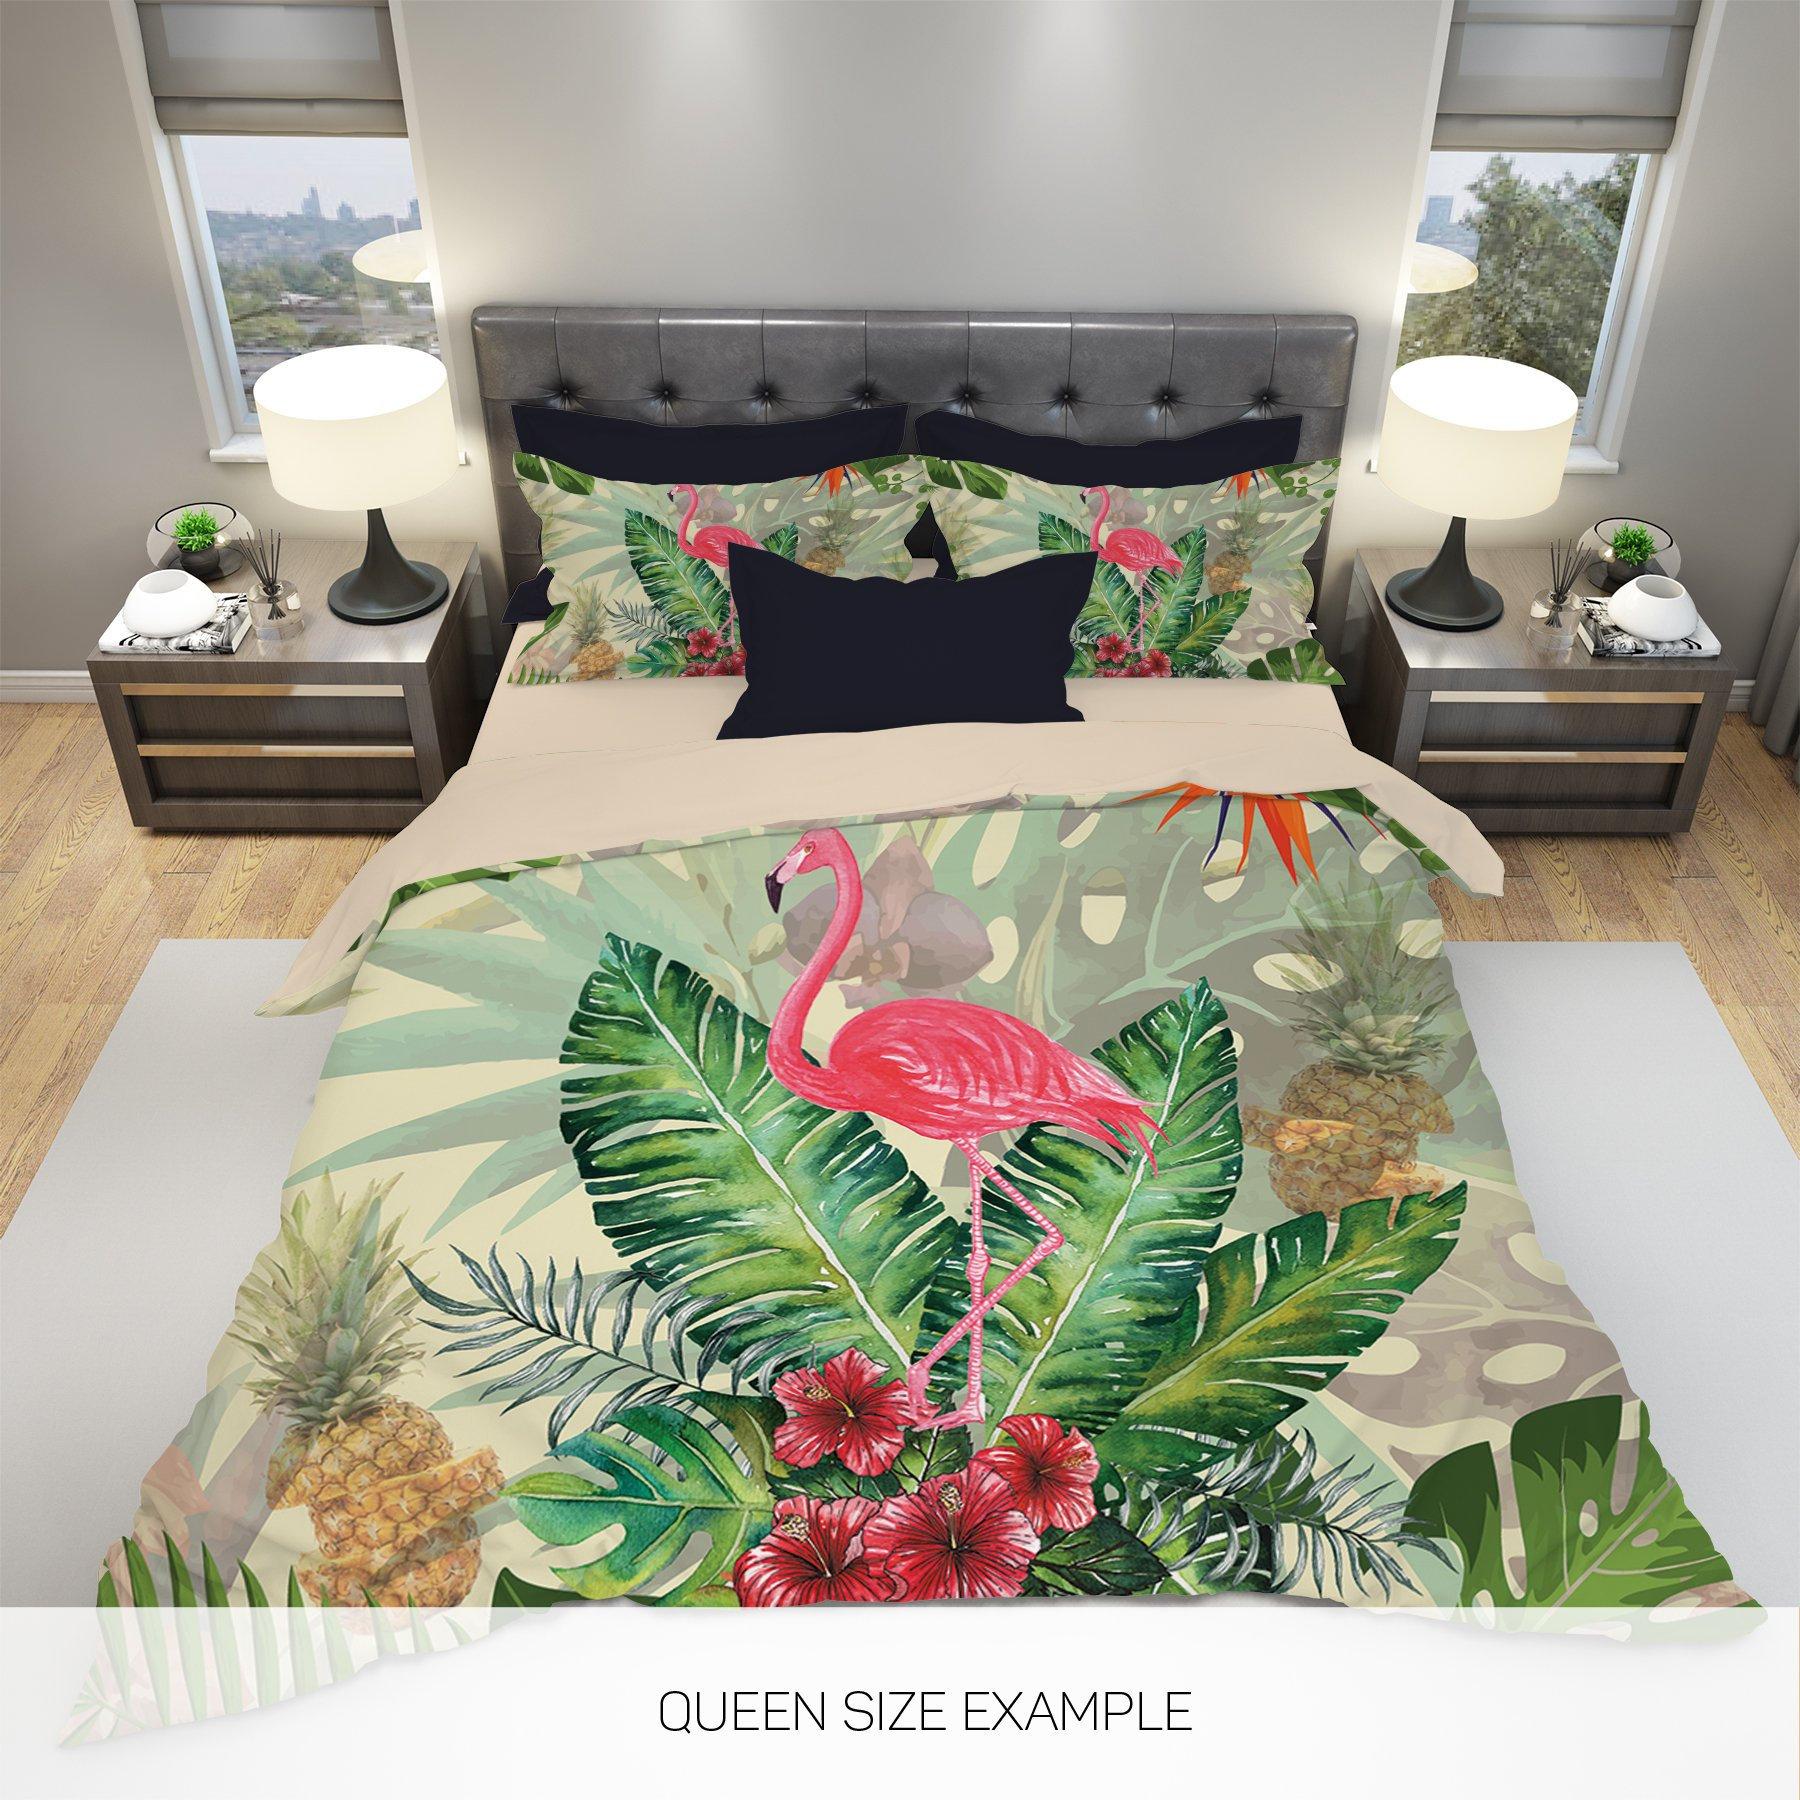 Abstract Bedding Modern Bedding Tropic Flower Bedding Hawaiian Bedding Tropical Bedding Art Duvet Cover Flamingo Bedding